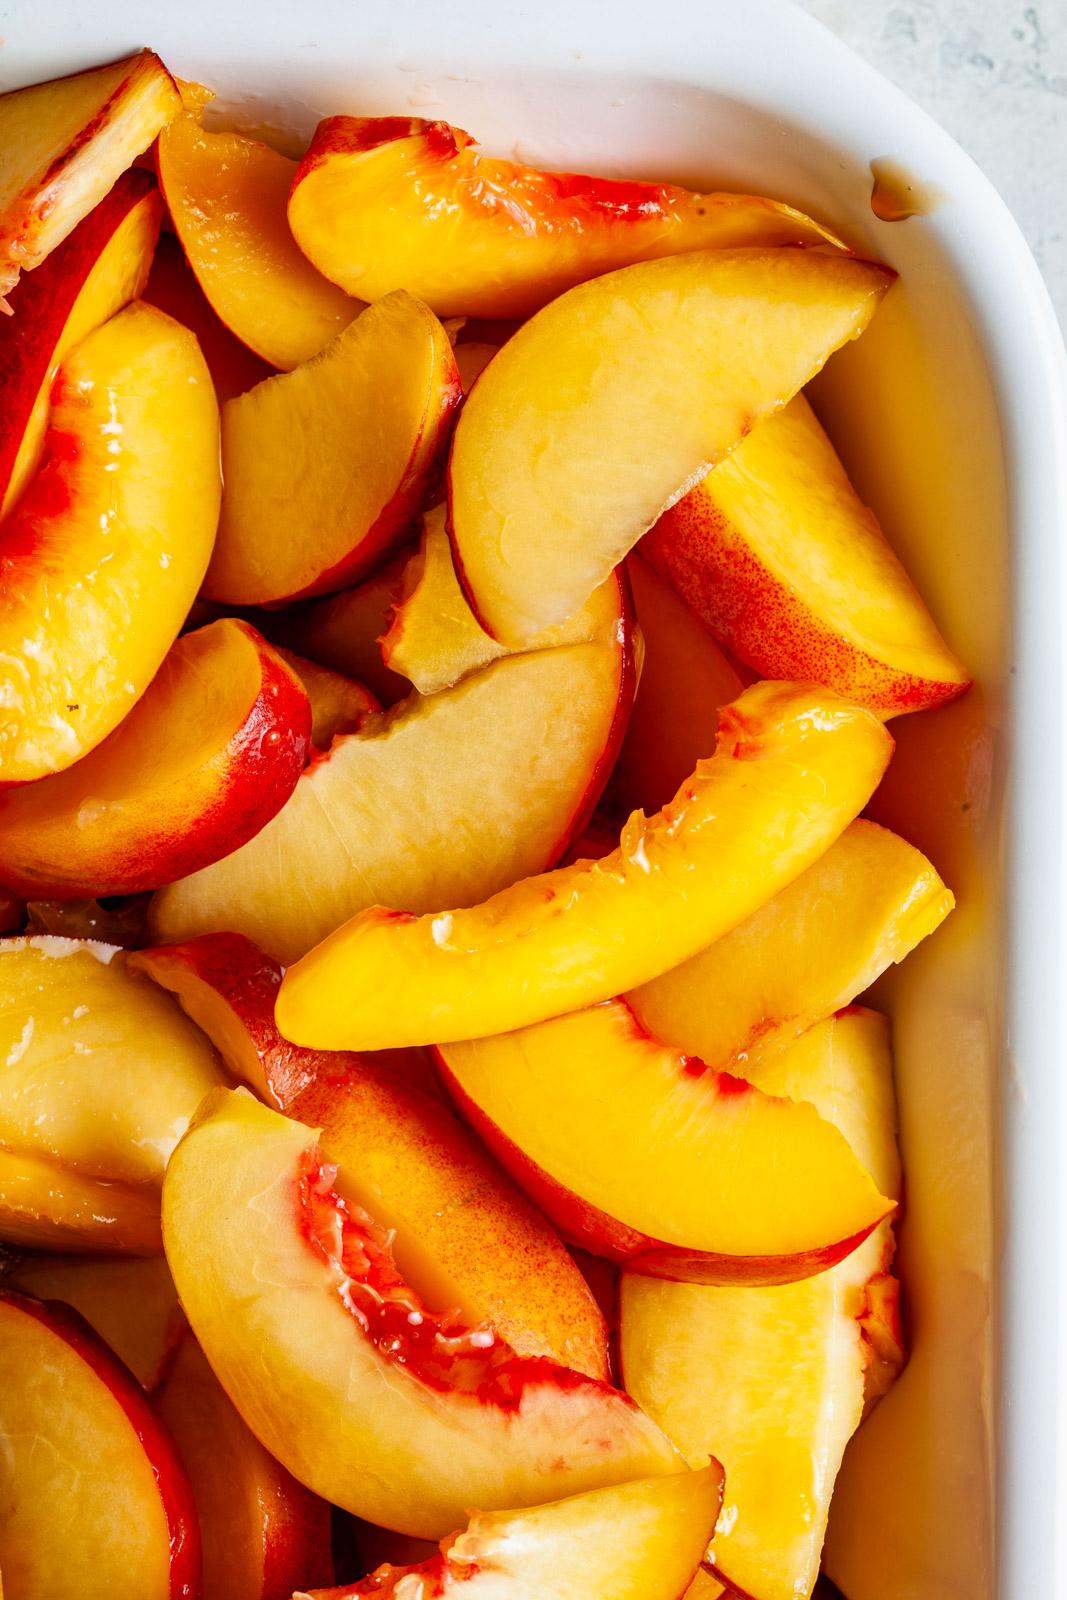 Peach and Nectarine Pecan Sandy Crumble